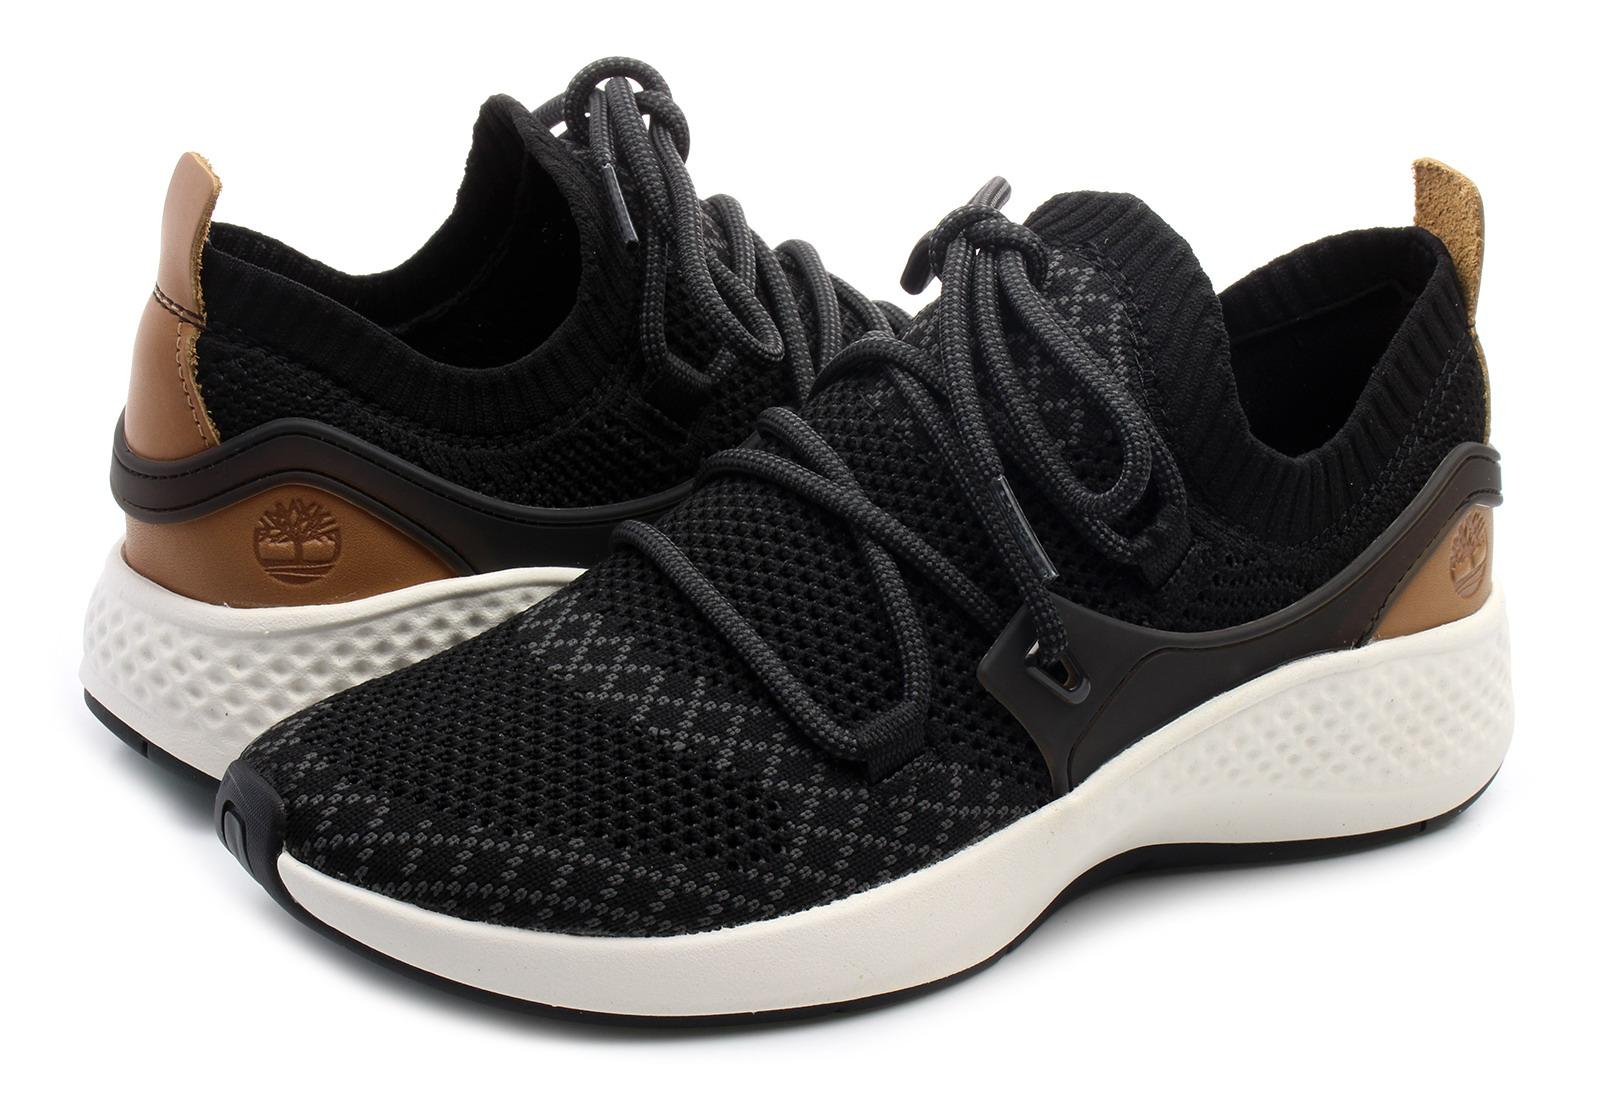 Sro Shoes Prices